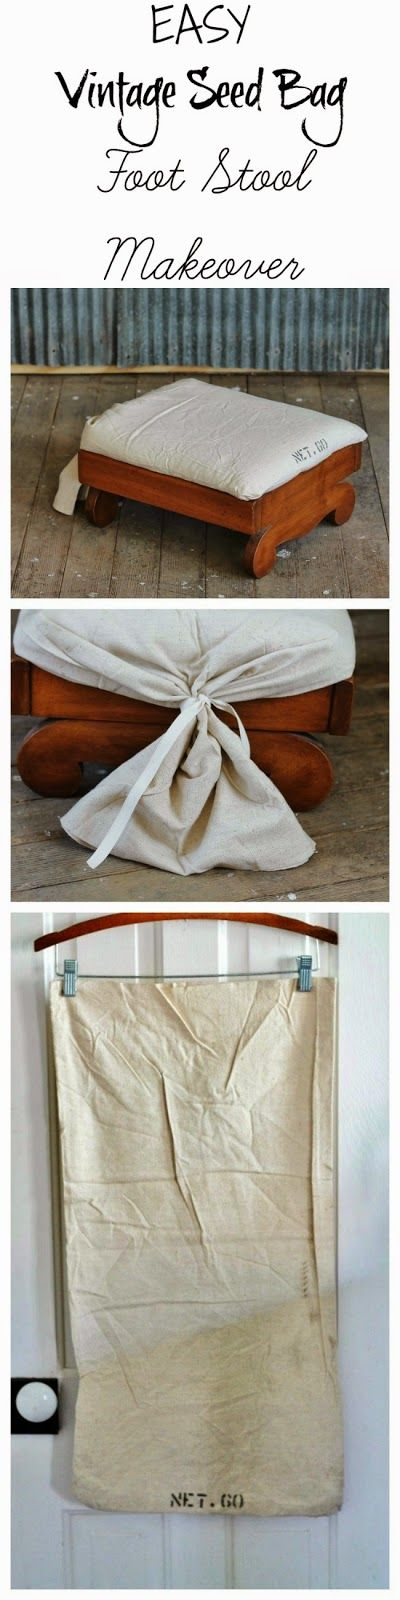 DIY Seed Bag Footstool Makeover - so quick and easy! ~~ via http://knickoftimeinteriors.blogspot.com/